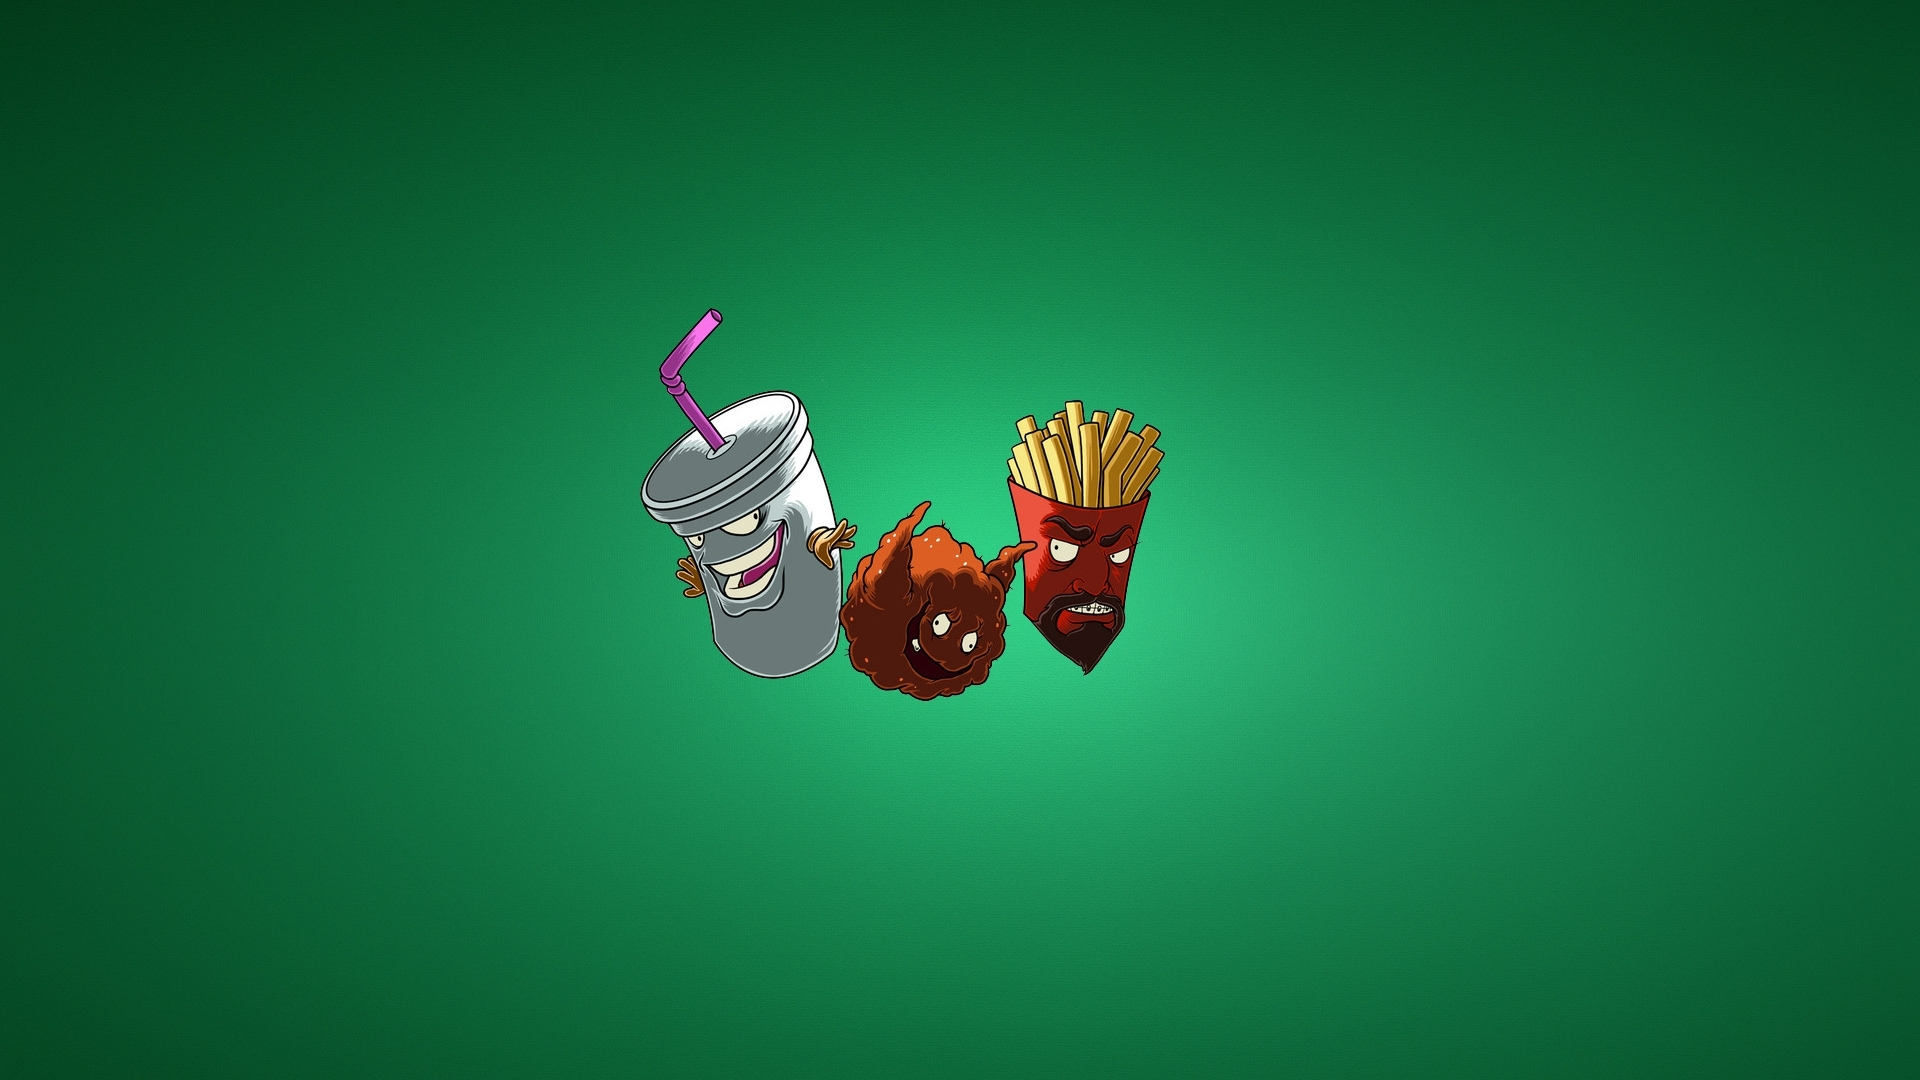 download wallpaper frylock, the fries, meatwad, milkshake